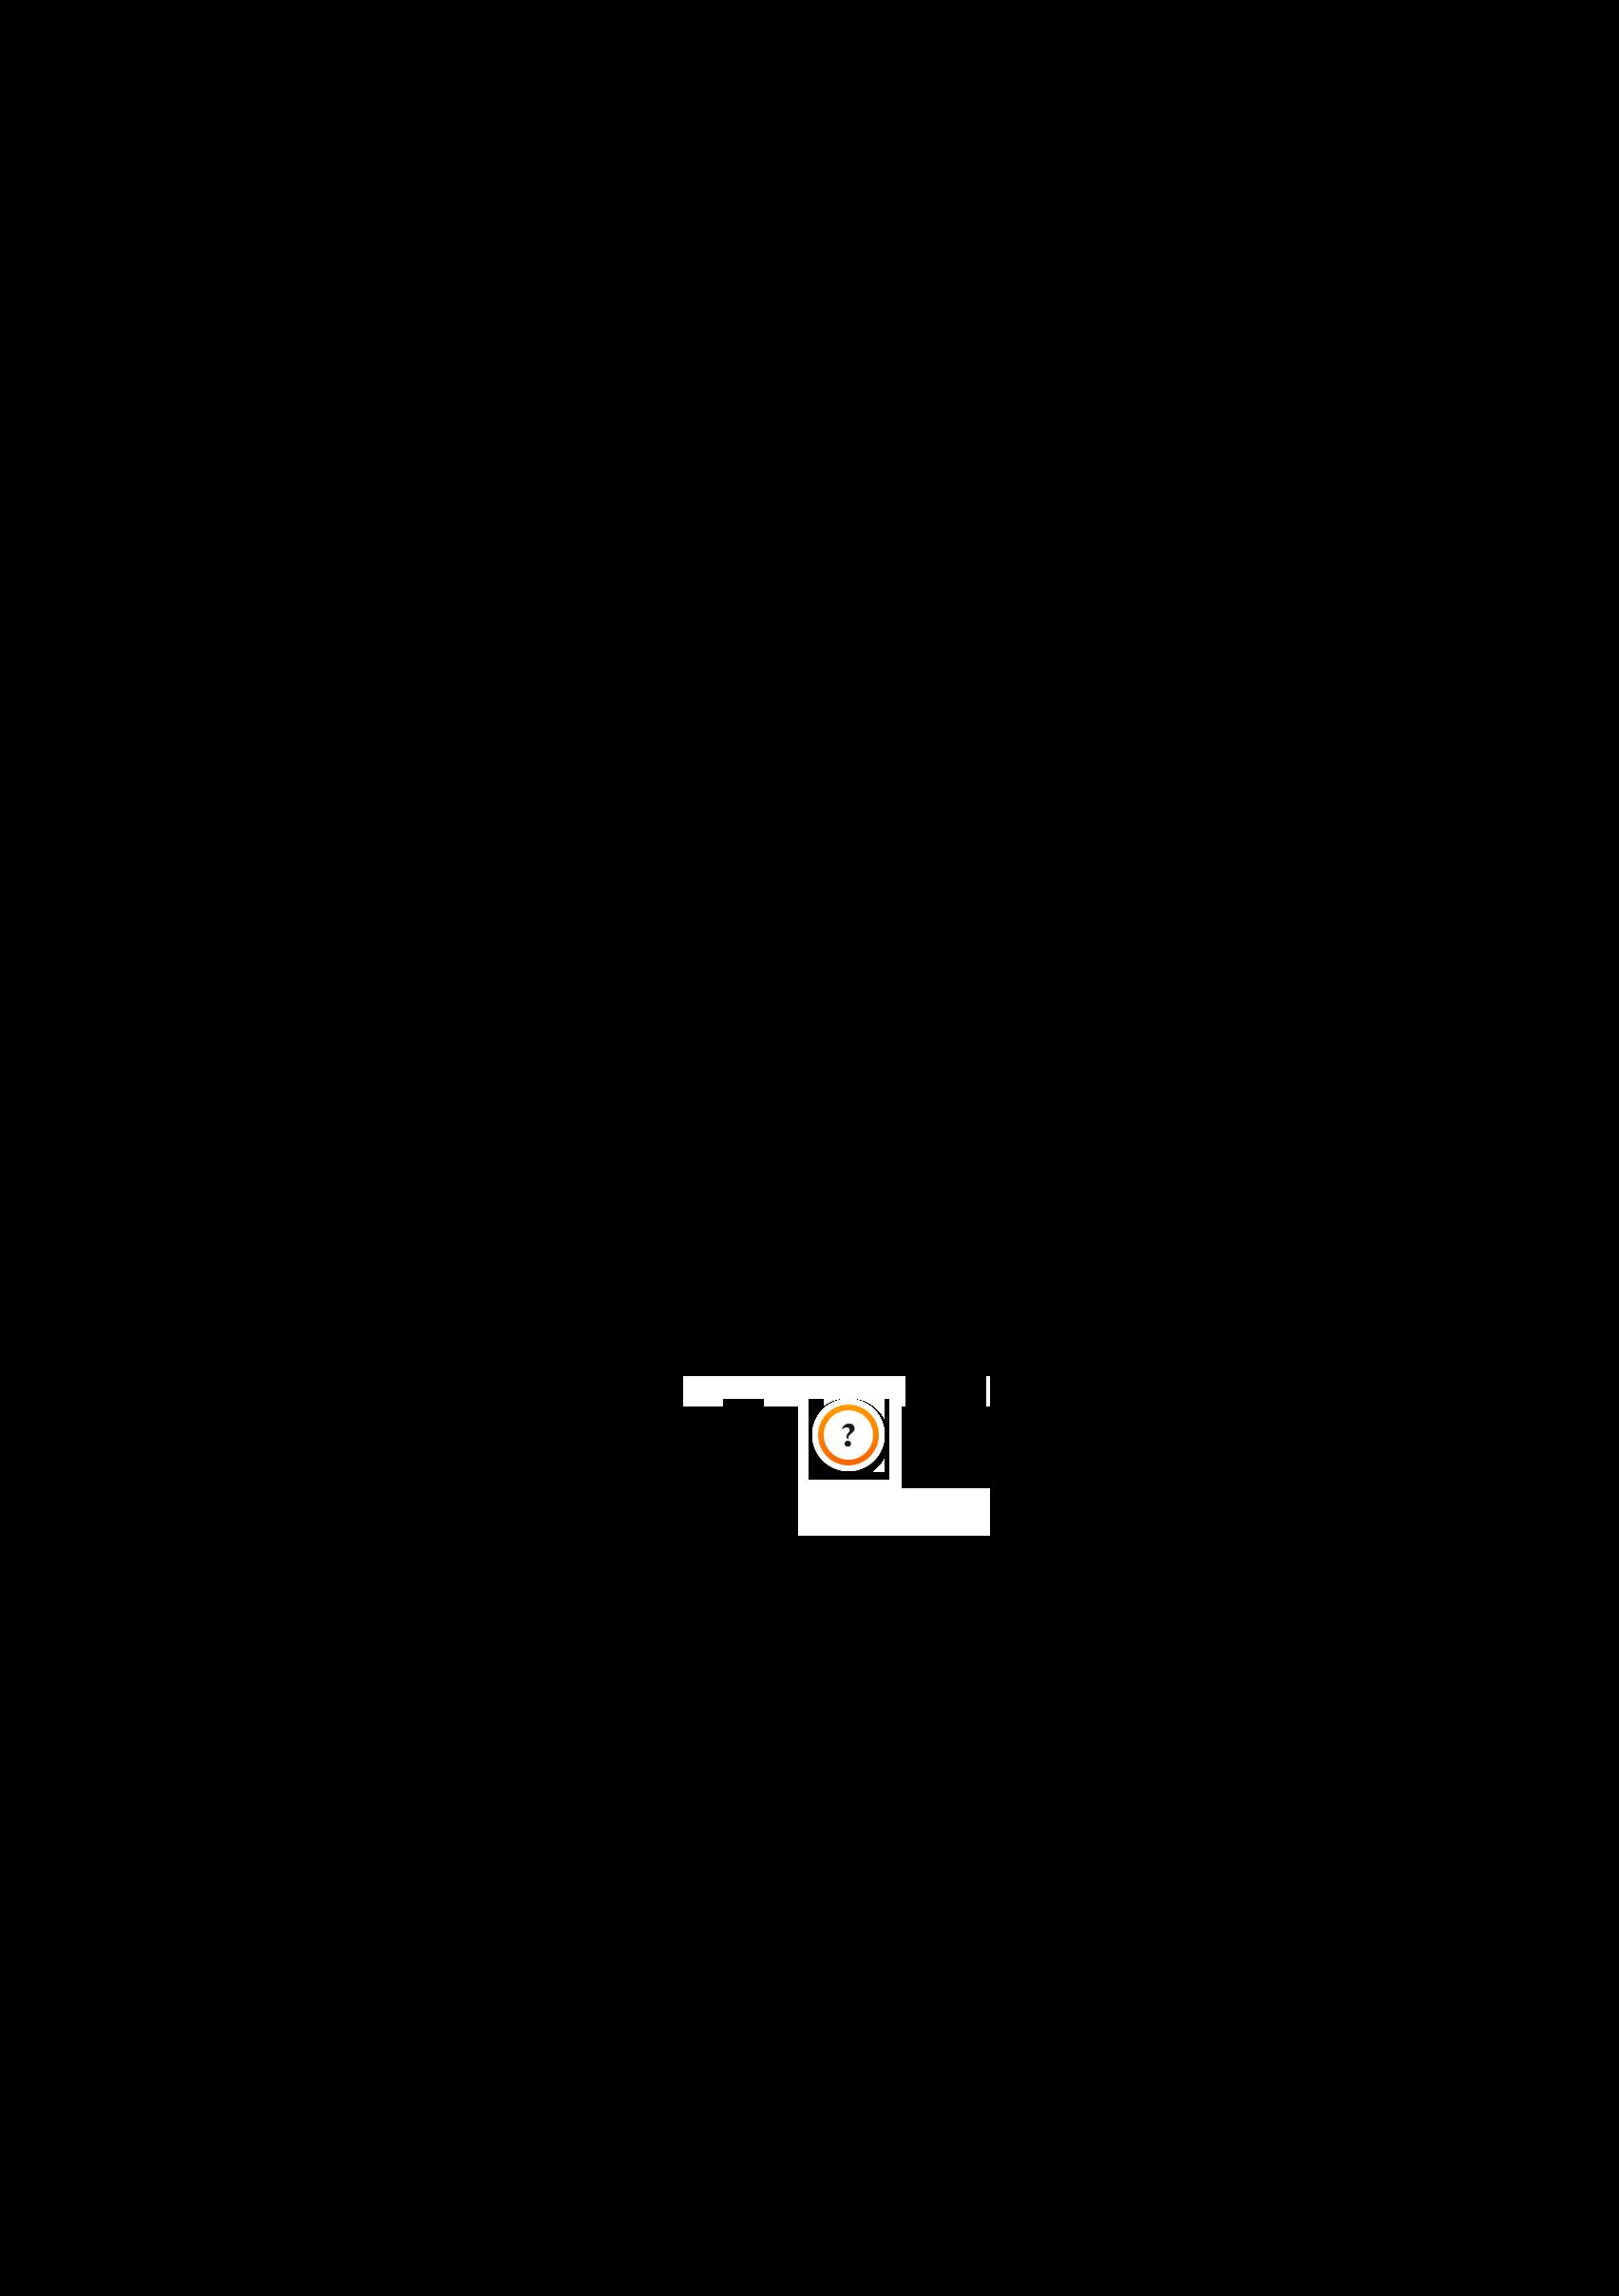 Mussel egg